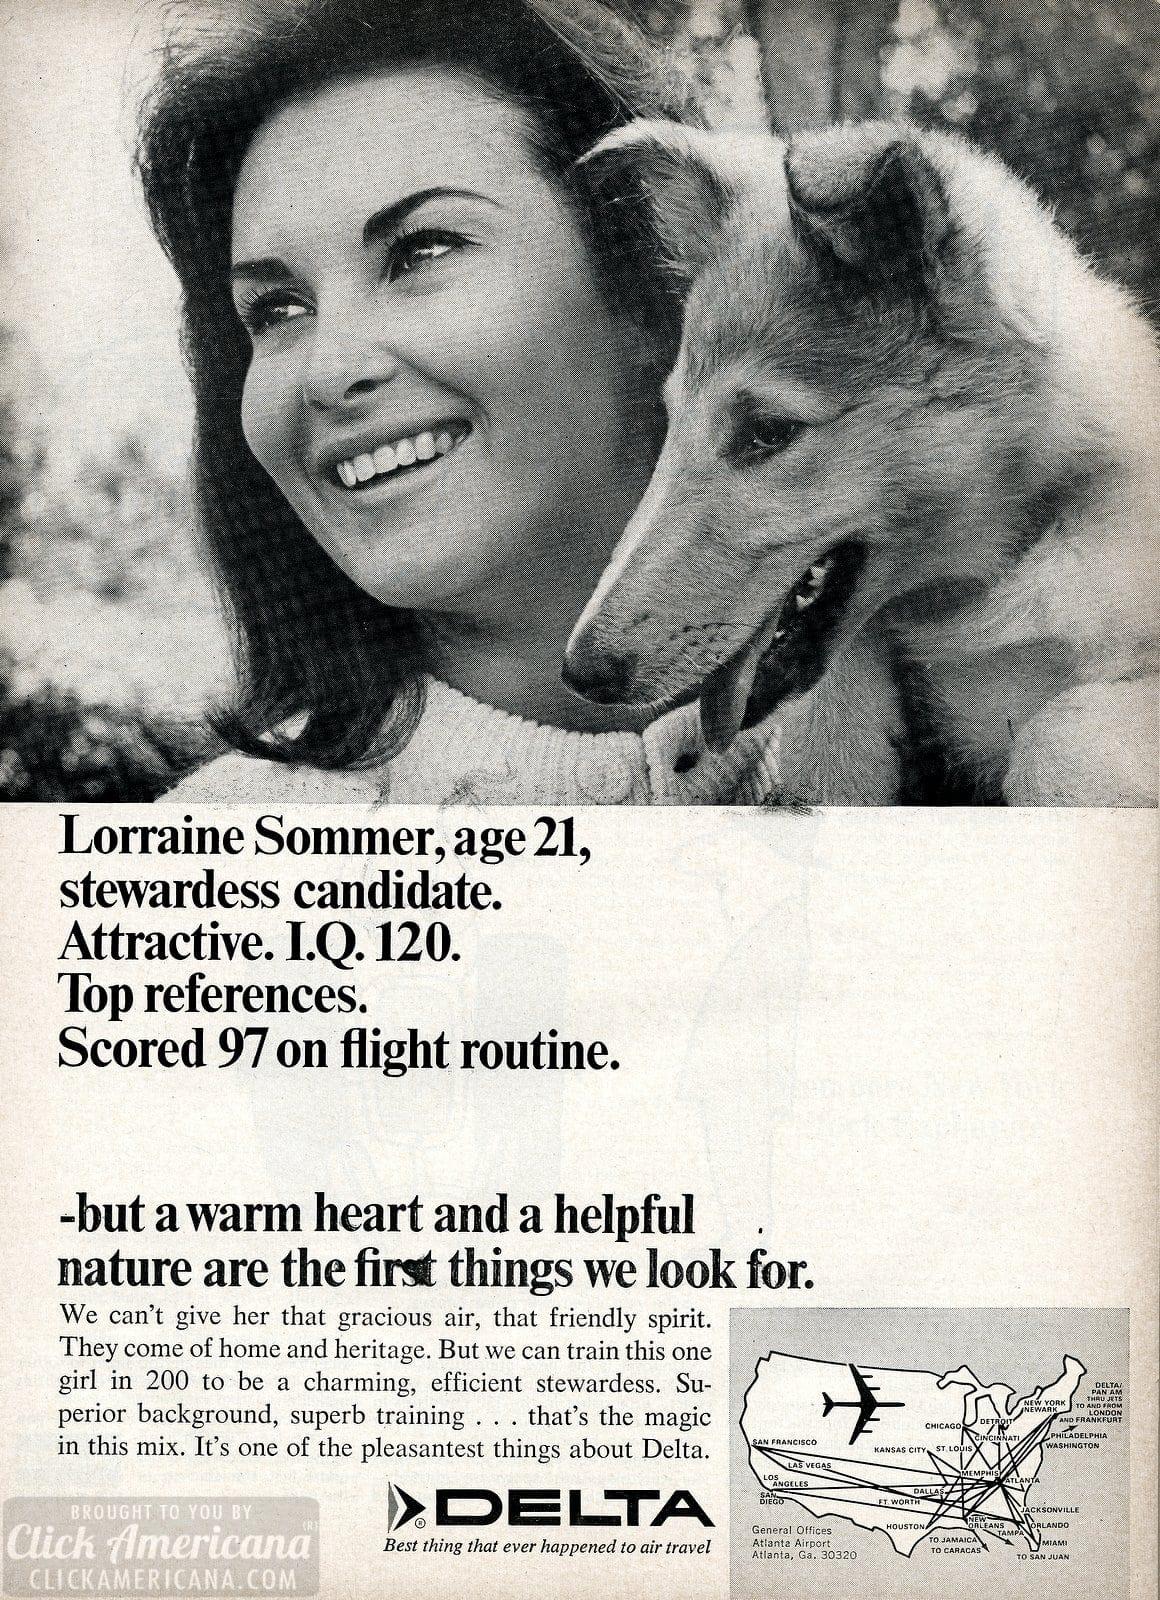 Delta airlines stewardess air hostess 1966